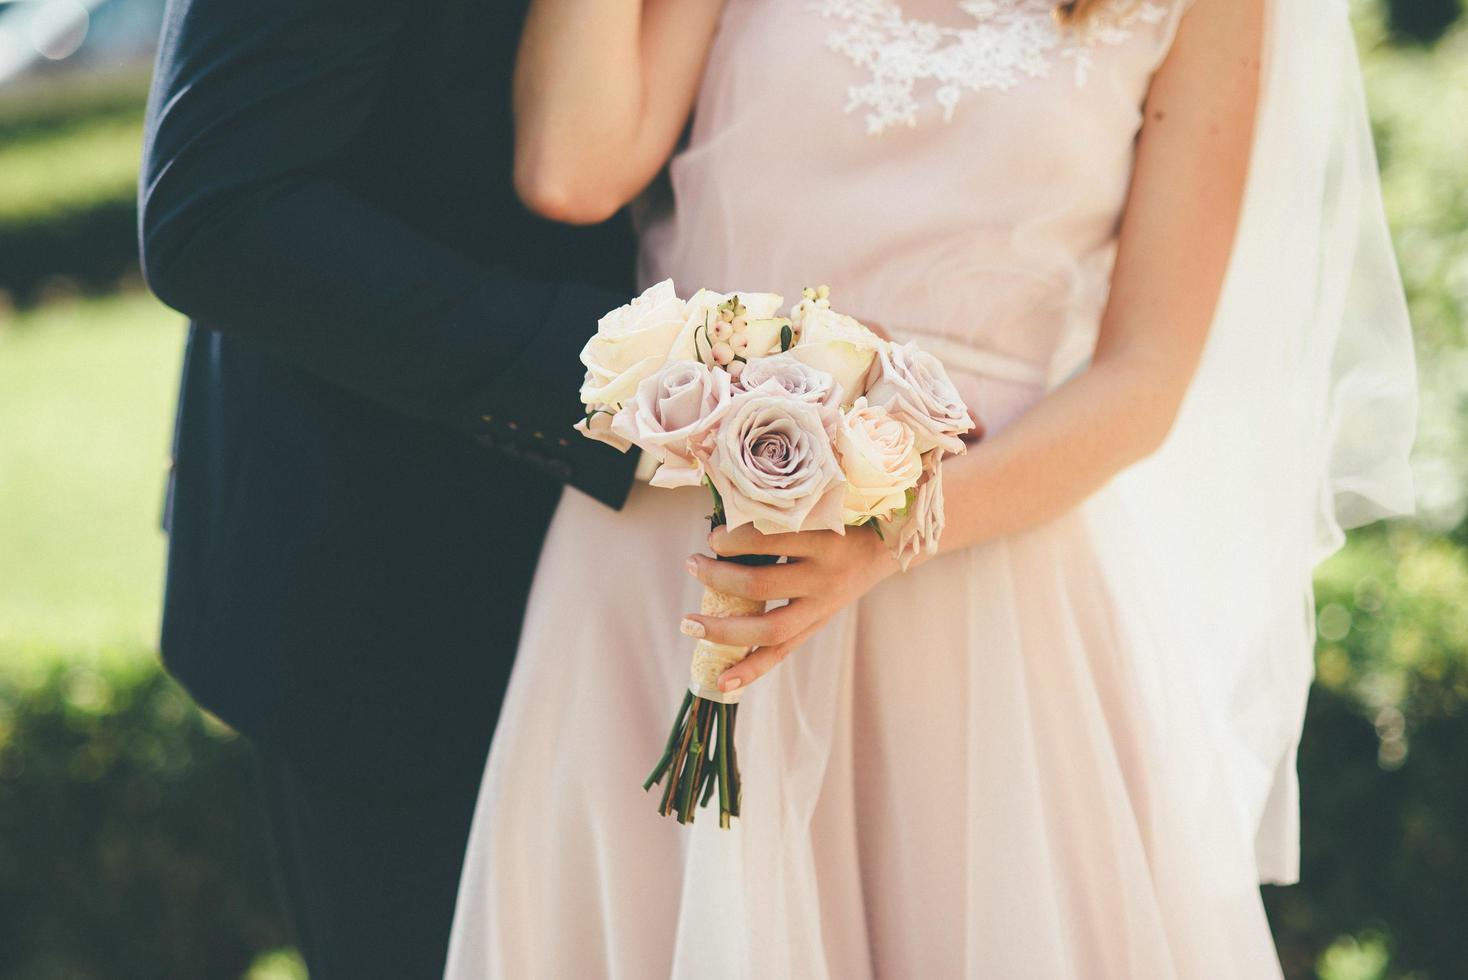 matrimonio con ramo rosa foto